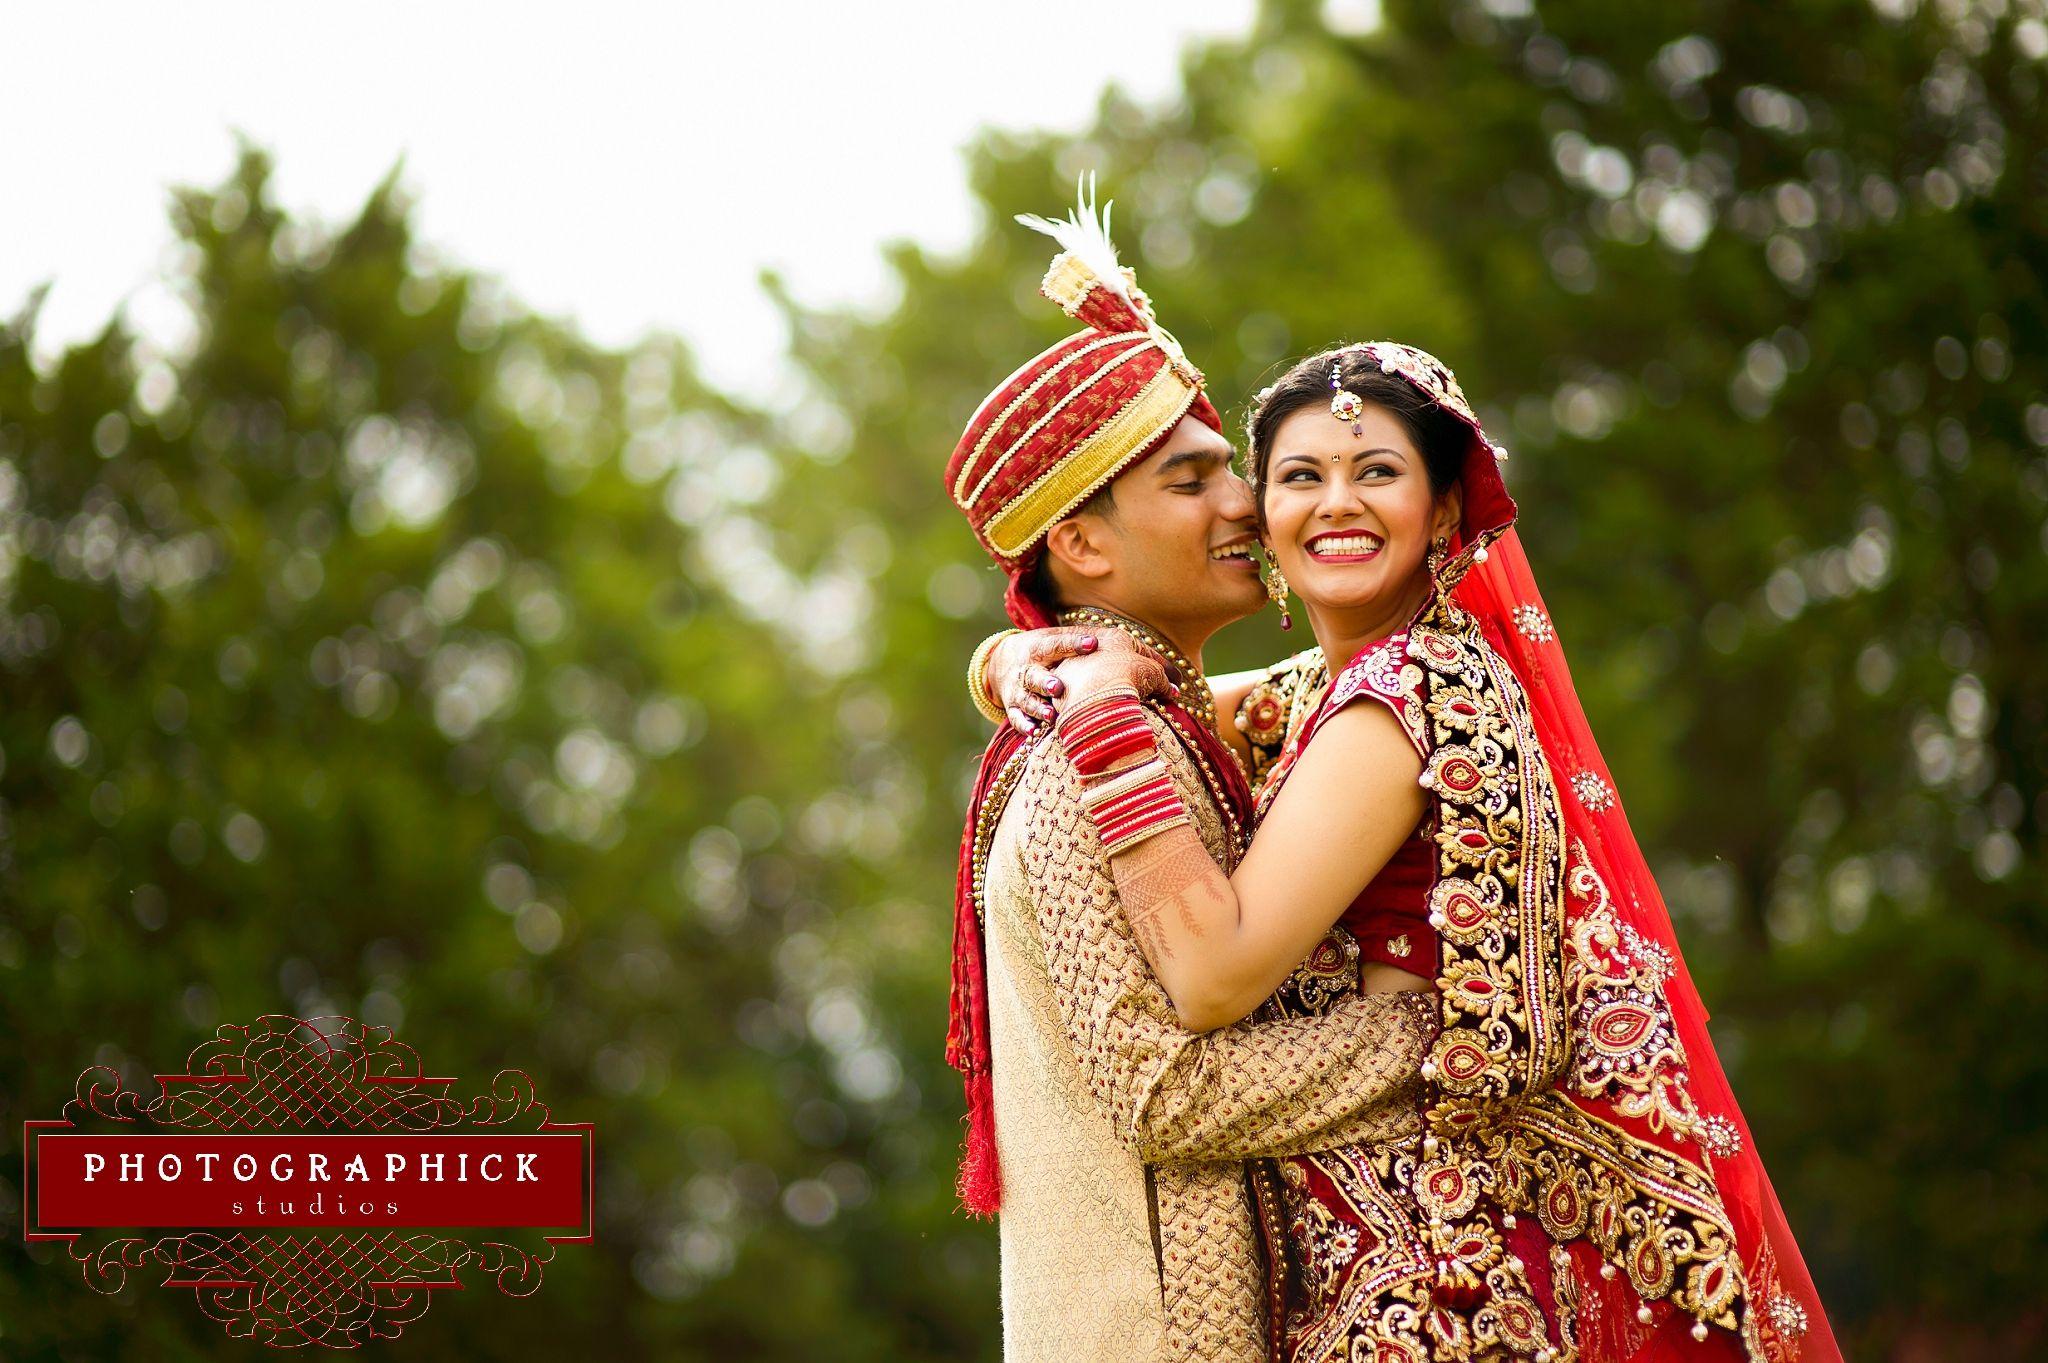 Hilton Dulles Indian Wedding Of Sumegha And Biraj